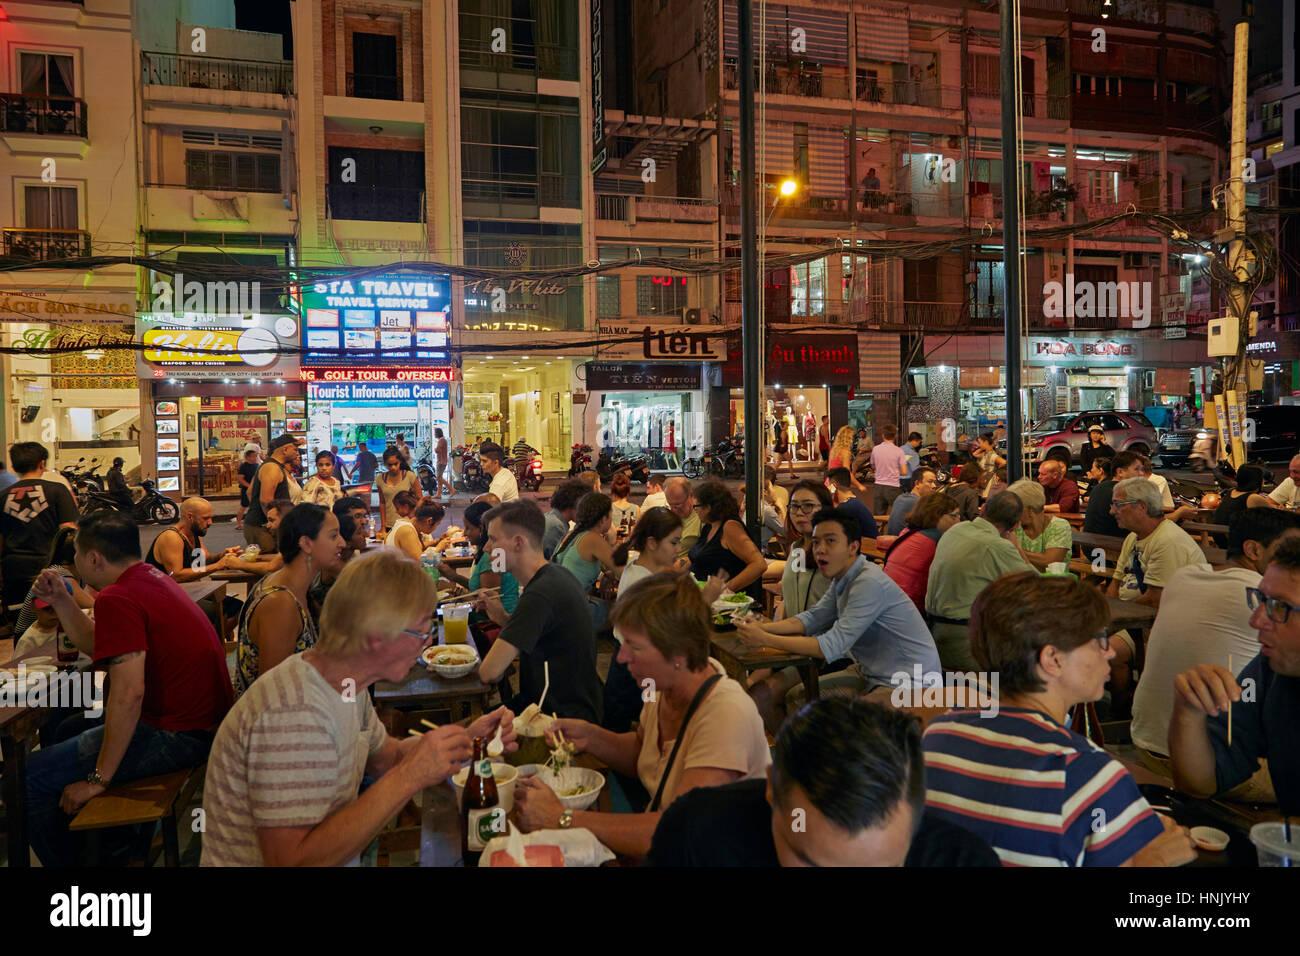 Stock Photo - Ben Thanh Street Food Market, Ho Chi Minh City (Saigon), Vietnam